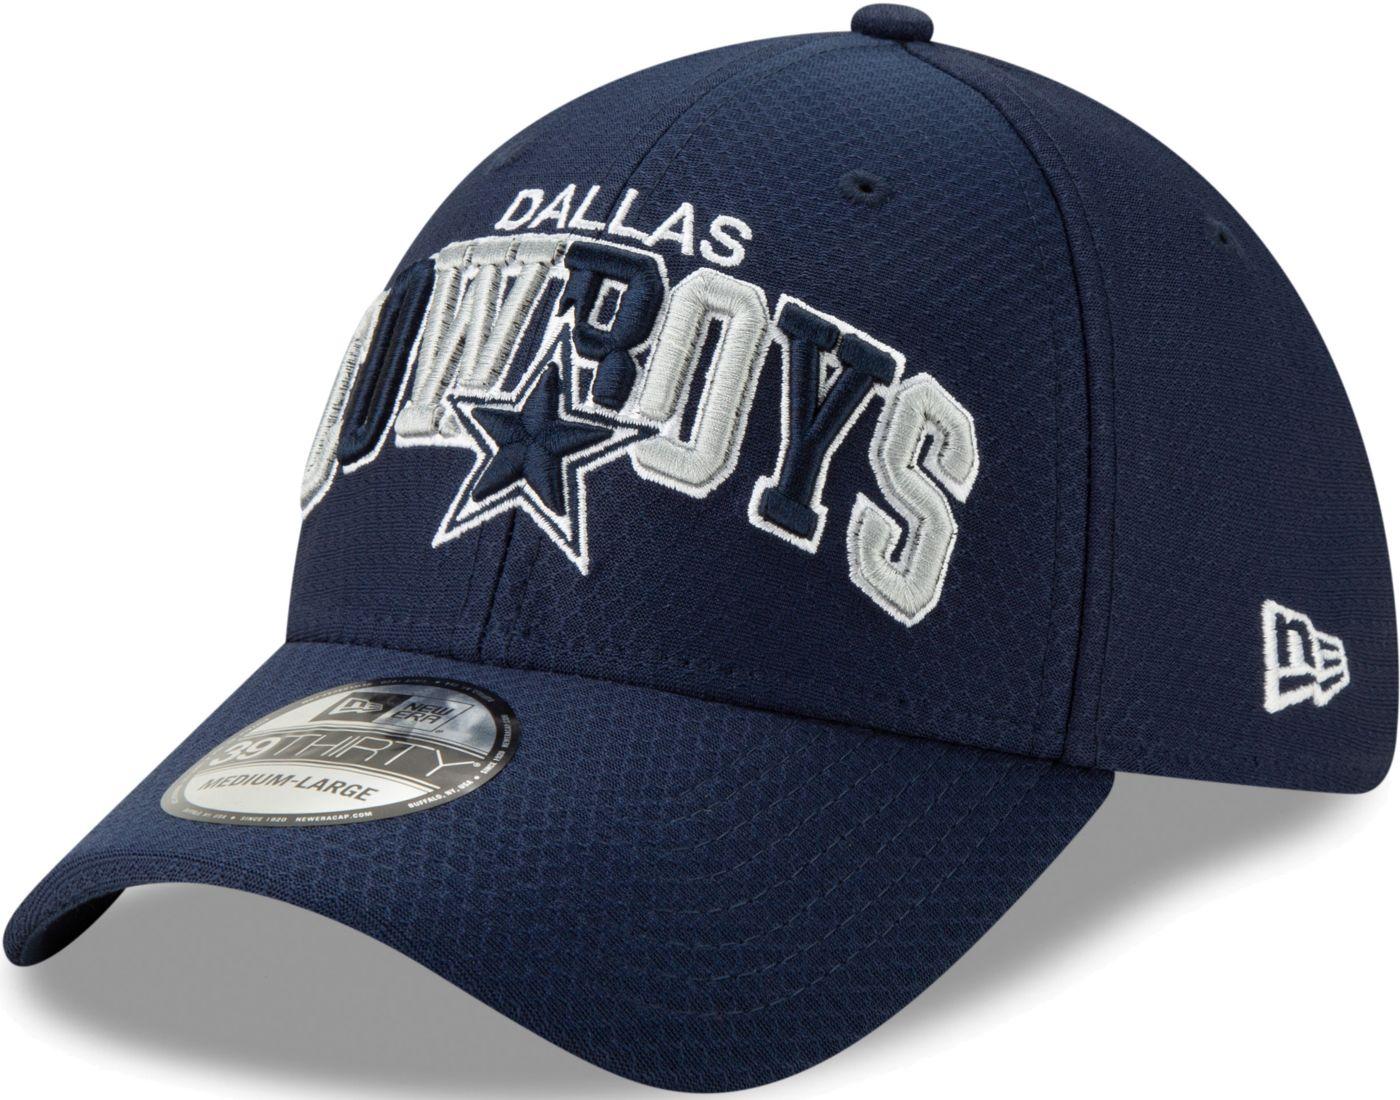 New Era Men's Dallas Cowboys Sideline Home 39Thirty Stretch Fit Hat